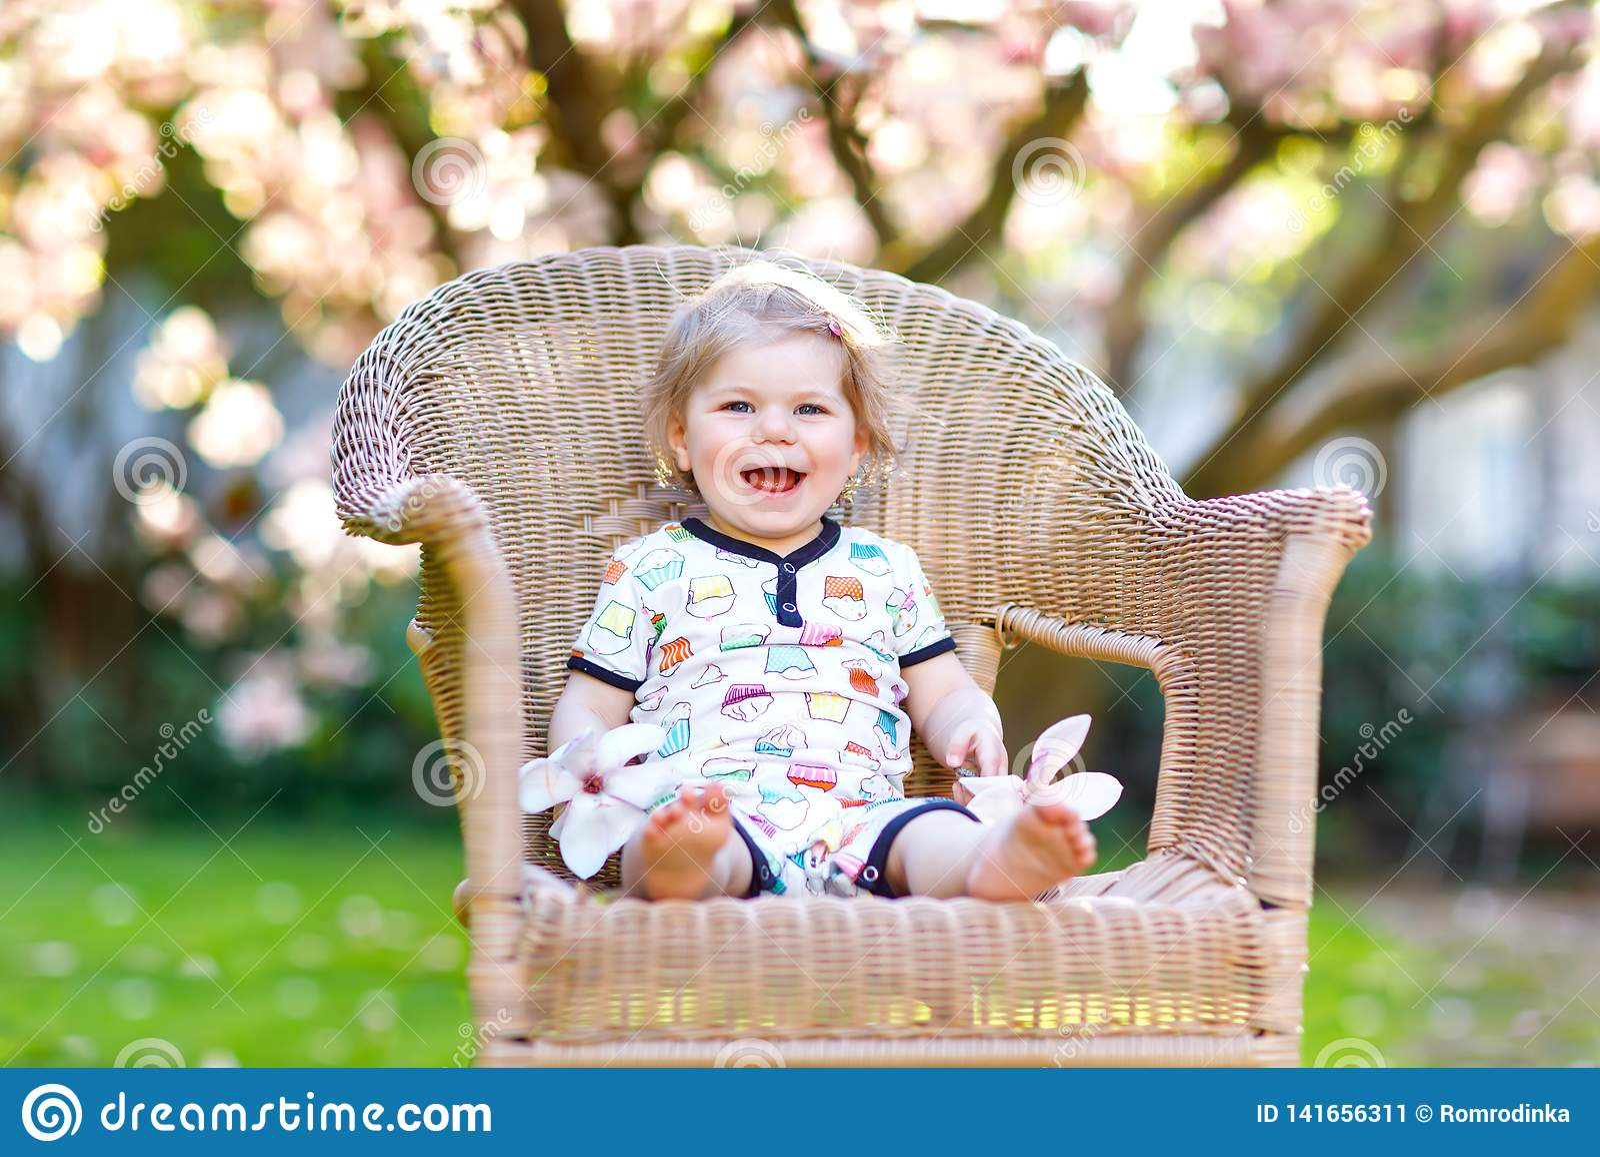 Cute Little Baby Girl Sitting On Big Chair In Garden Beautiful